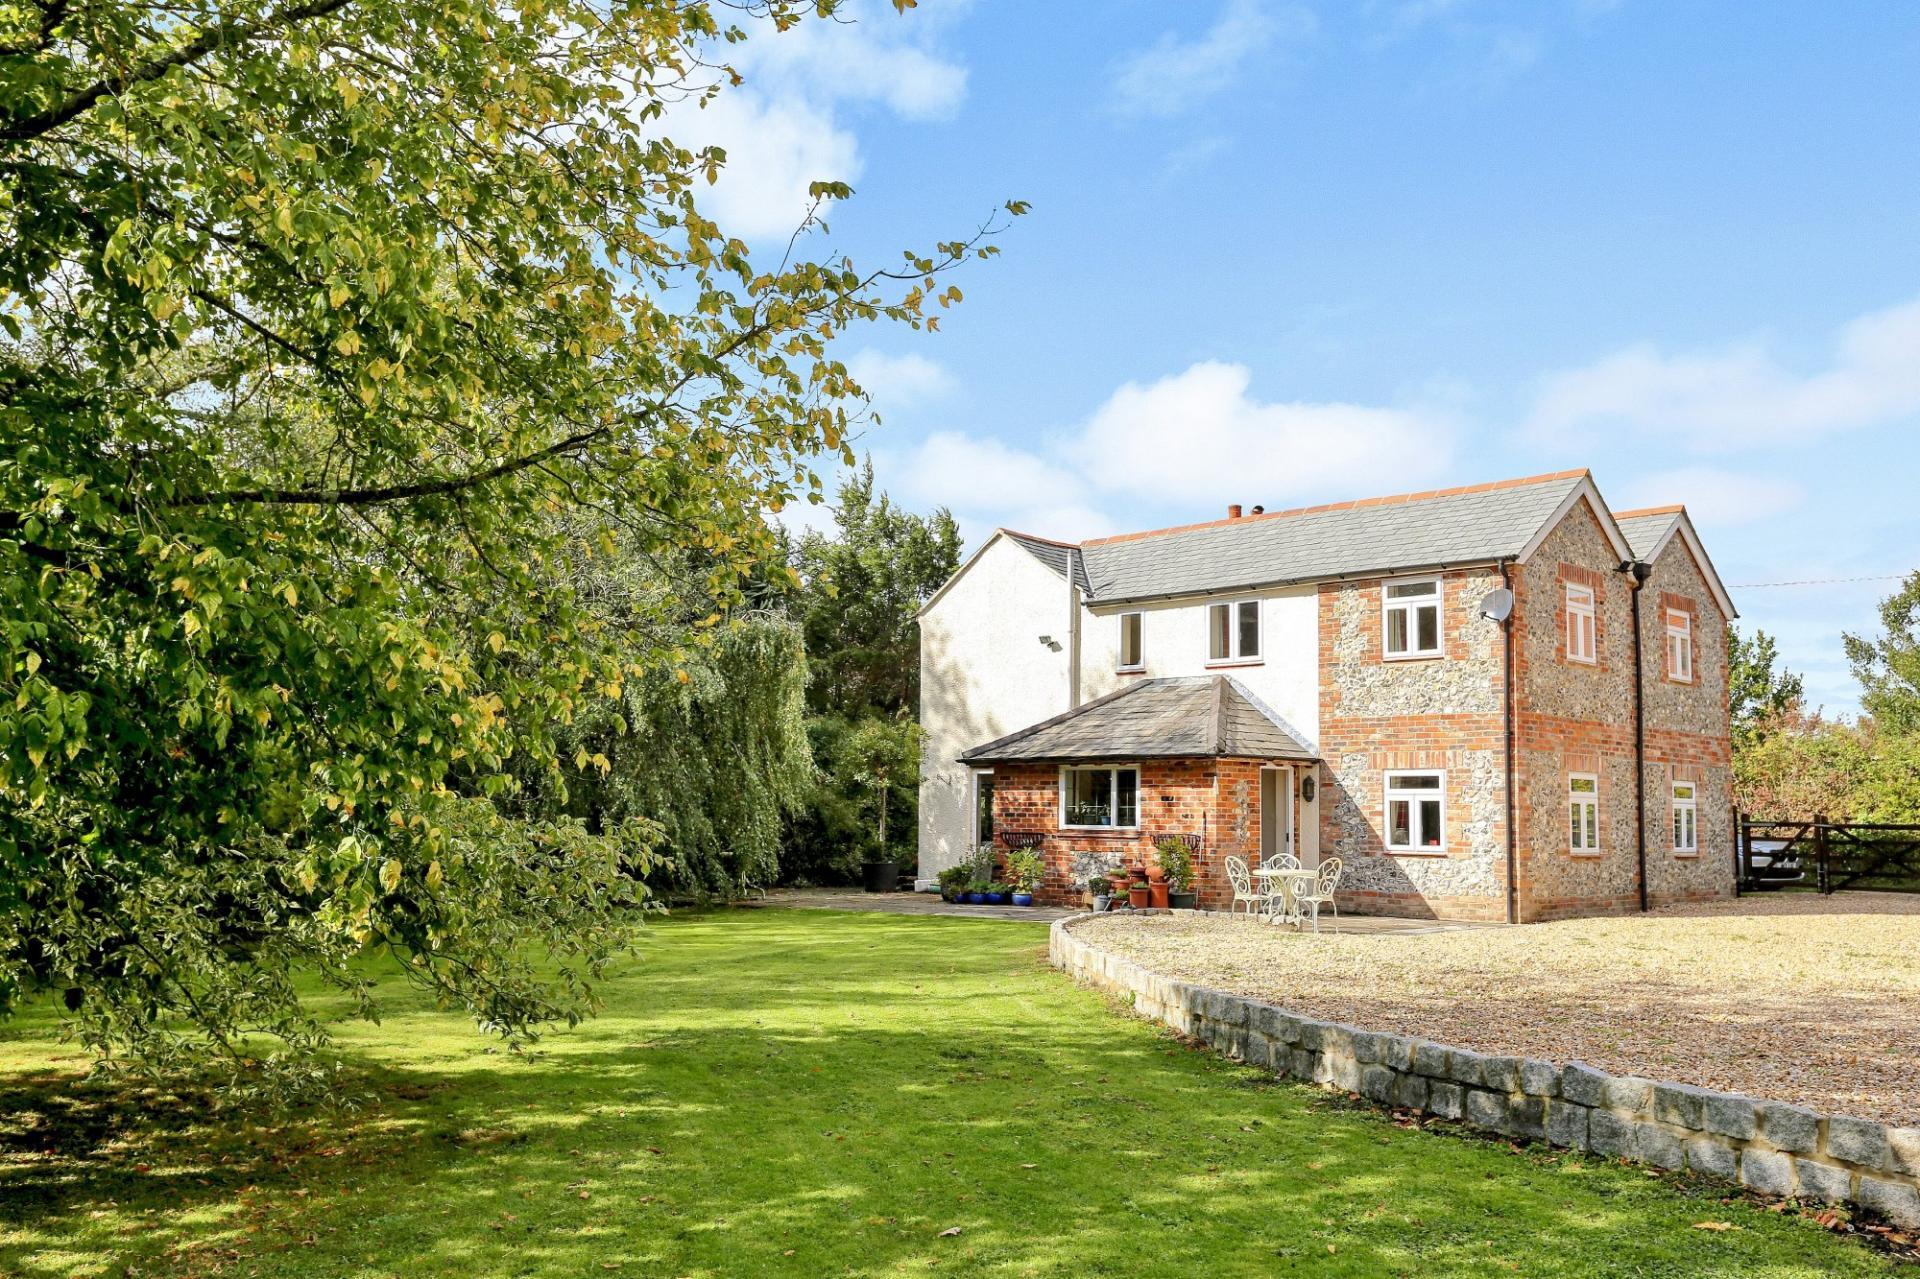 hampshire pretty stone and brick country home